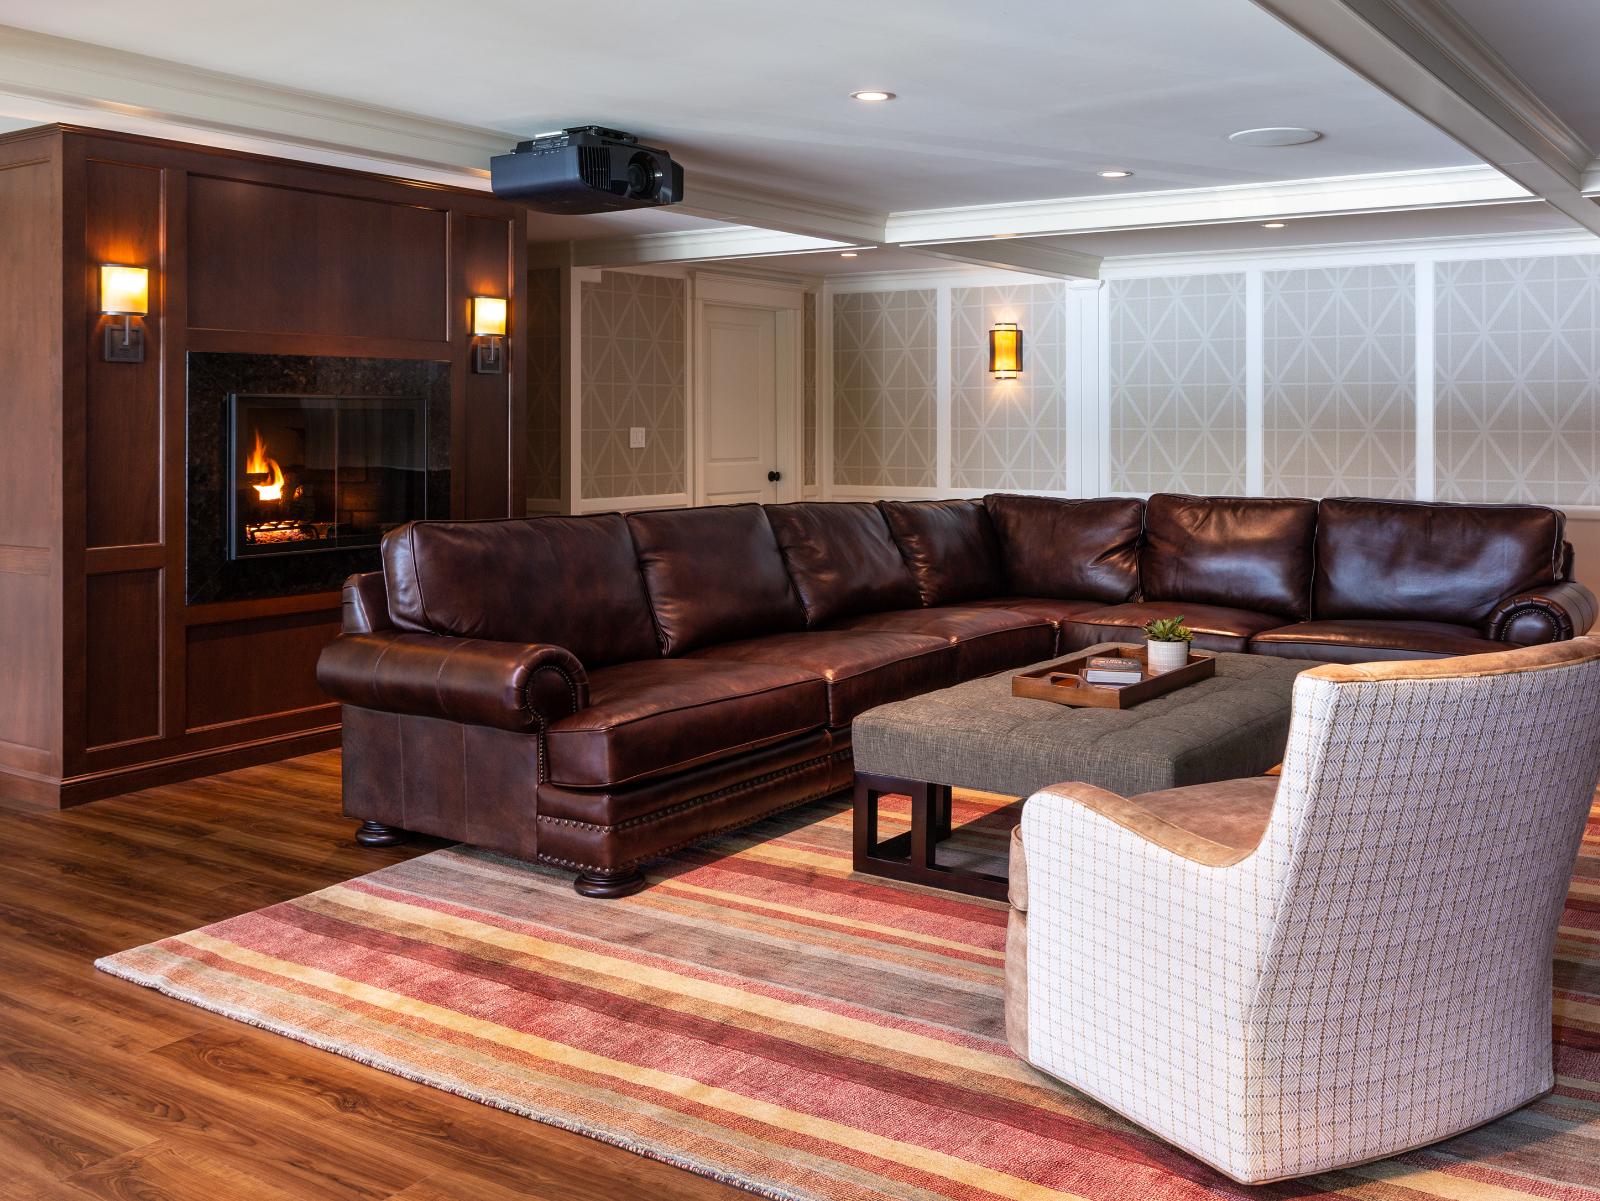 Living space design idea textured wallpaper